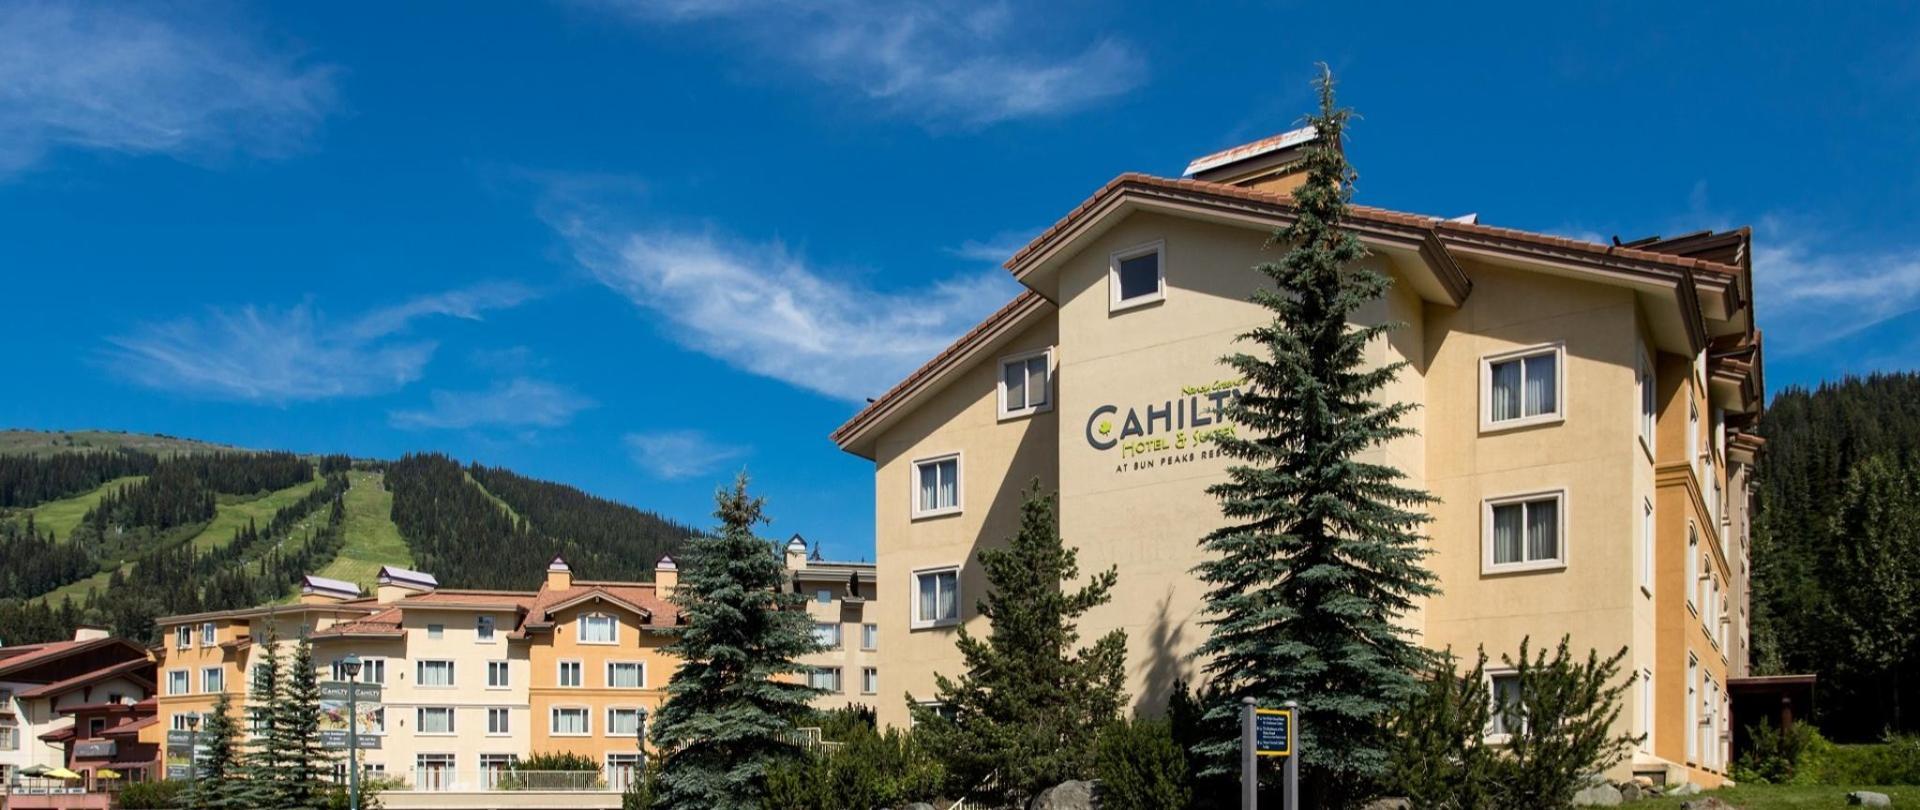 Cahilty Lodge-PRINT-1.jpg